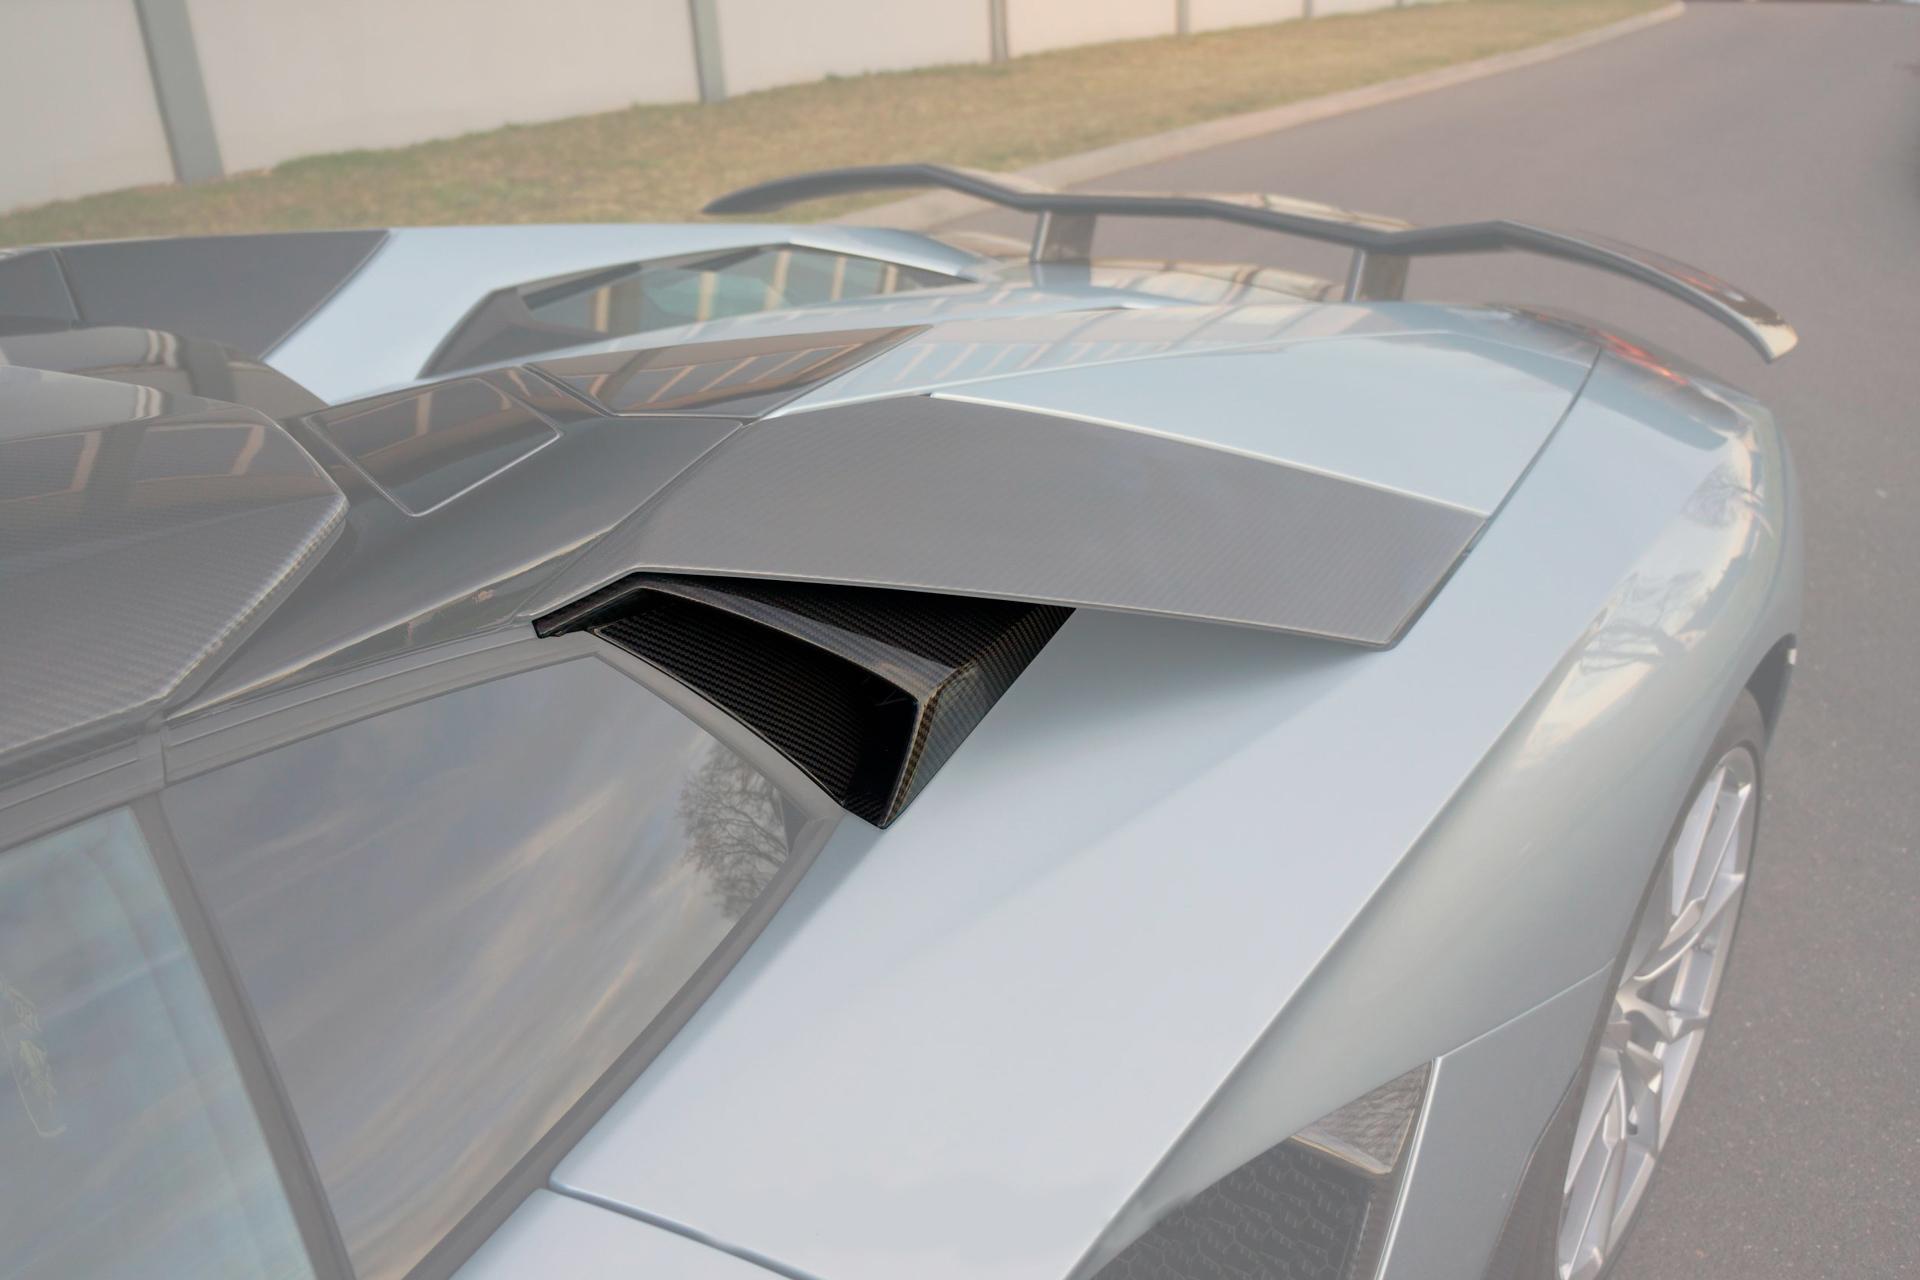 Hodoor Performance Carbon fiber upper small air intakes Mansory Style 2 for Lamborghini Aventador